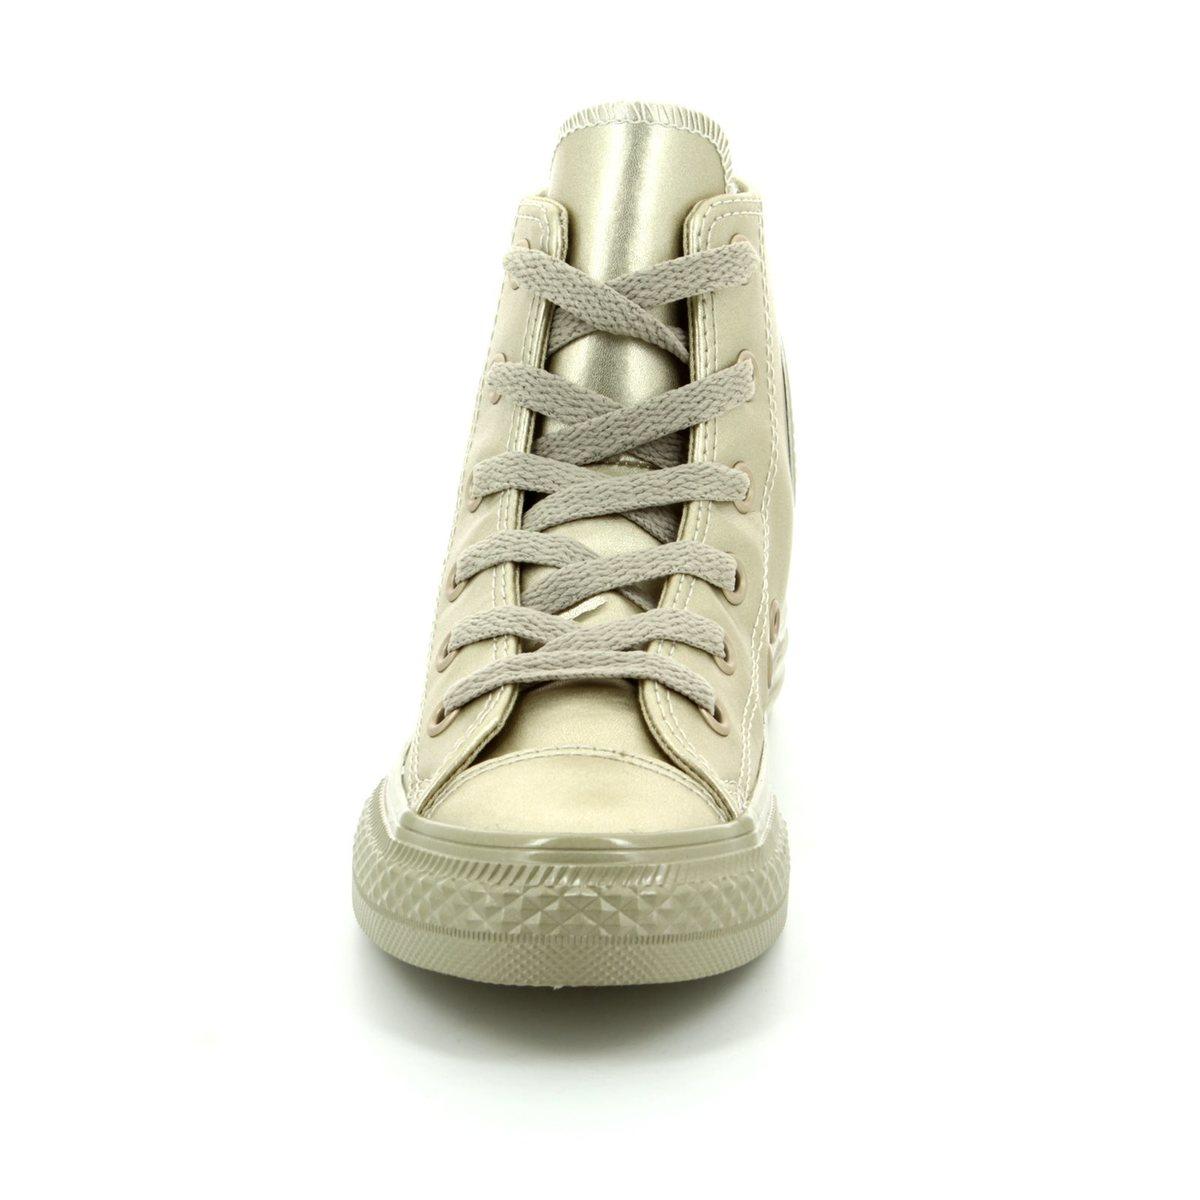 Converse Trainers - Gold - 357631C Chuck Taylor Junior ALL STAR HI TOP a369f8f8c9bf7